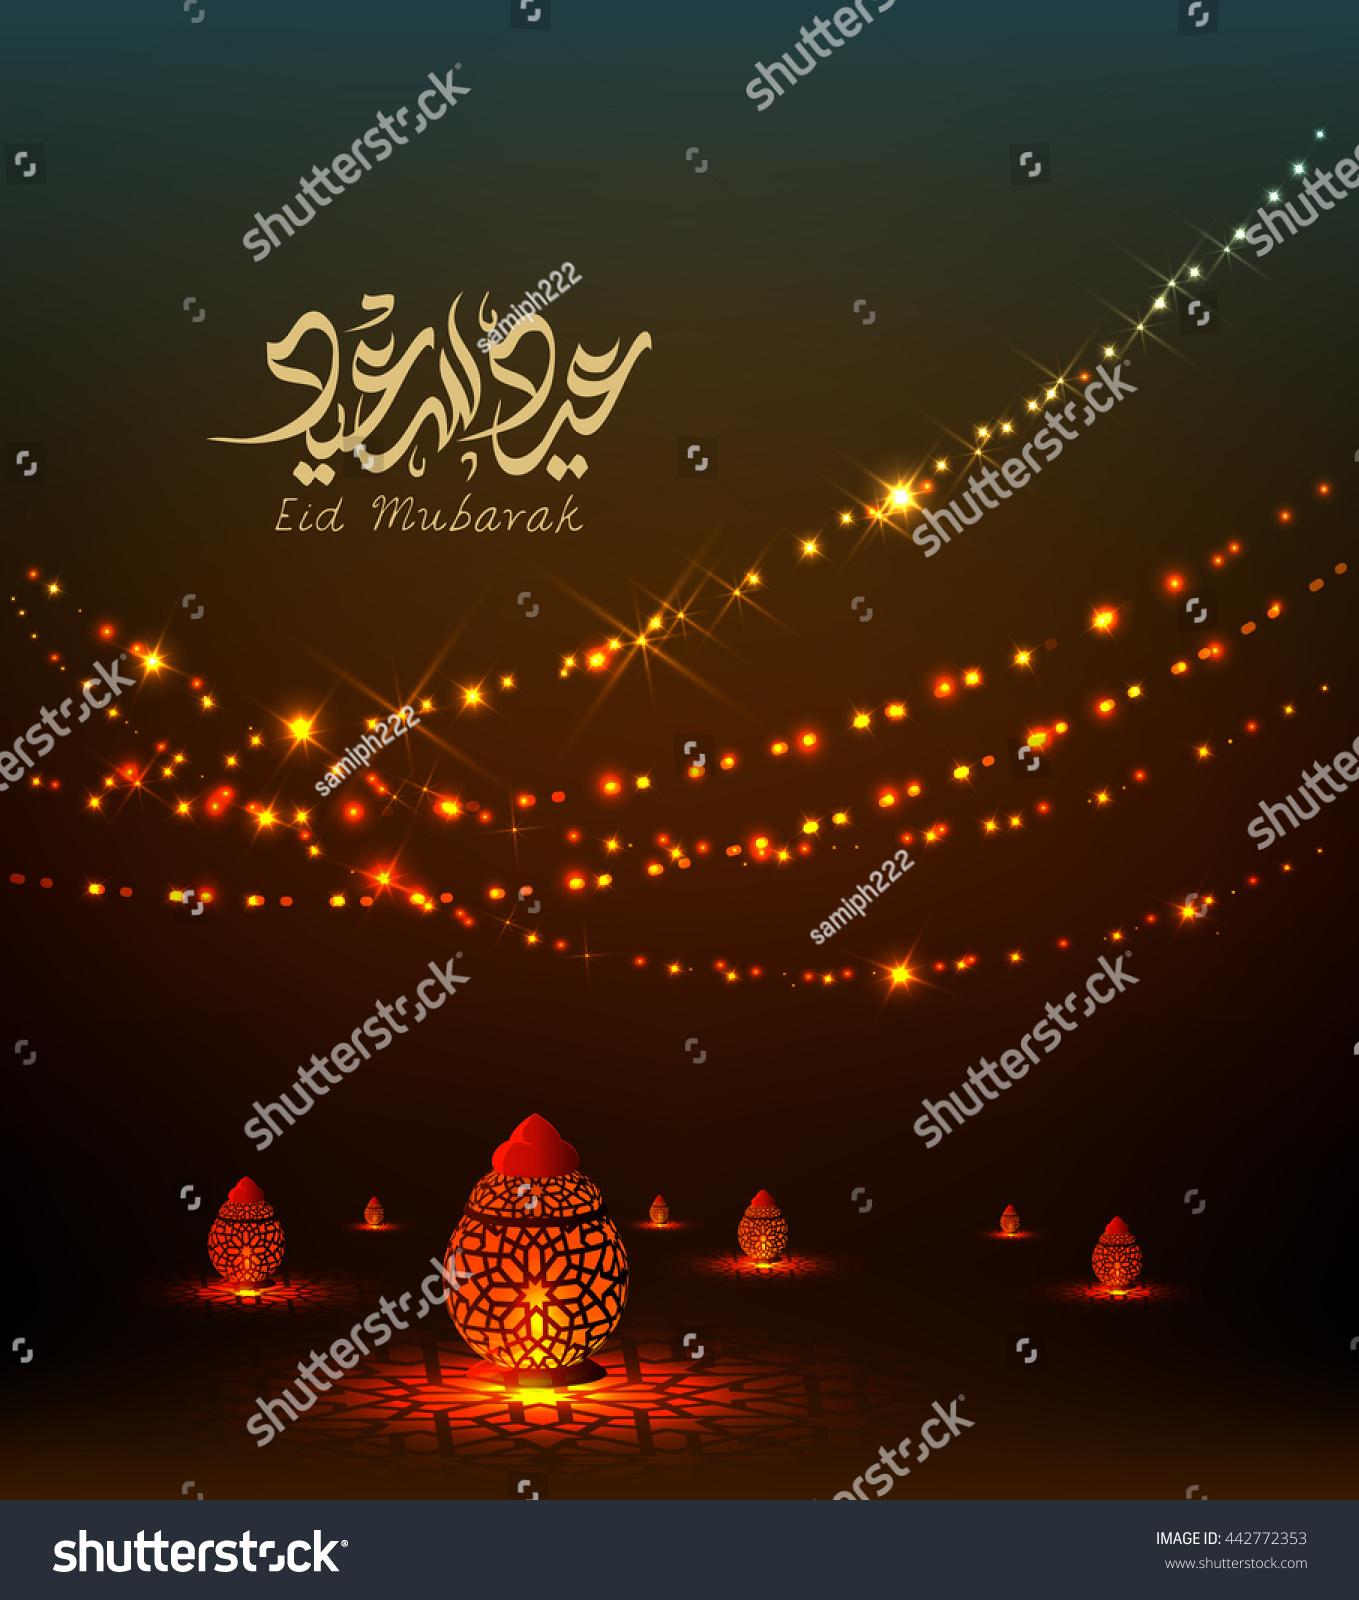 Eid mubarak greeting card eid said stock vector 442772353 shutterstock eid mubarak greeting card eid said eid al fitr eid al adha kristyandbryce Choice Image